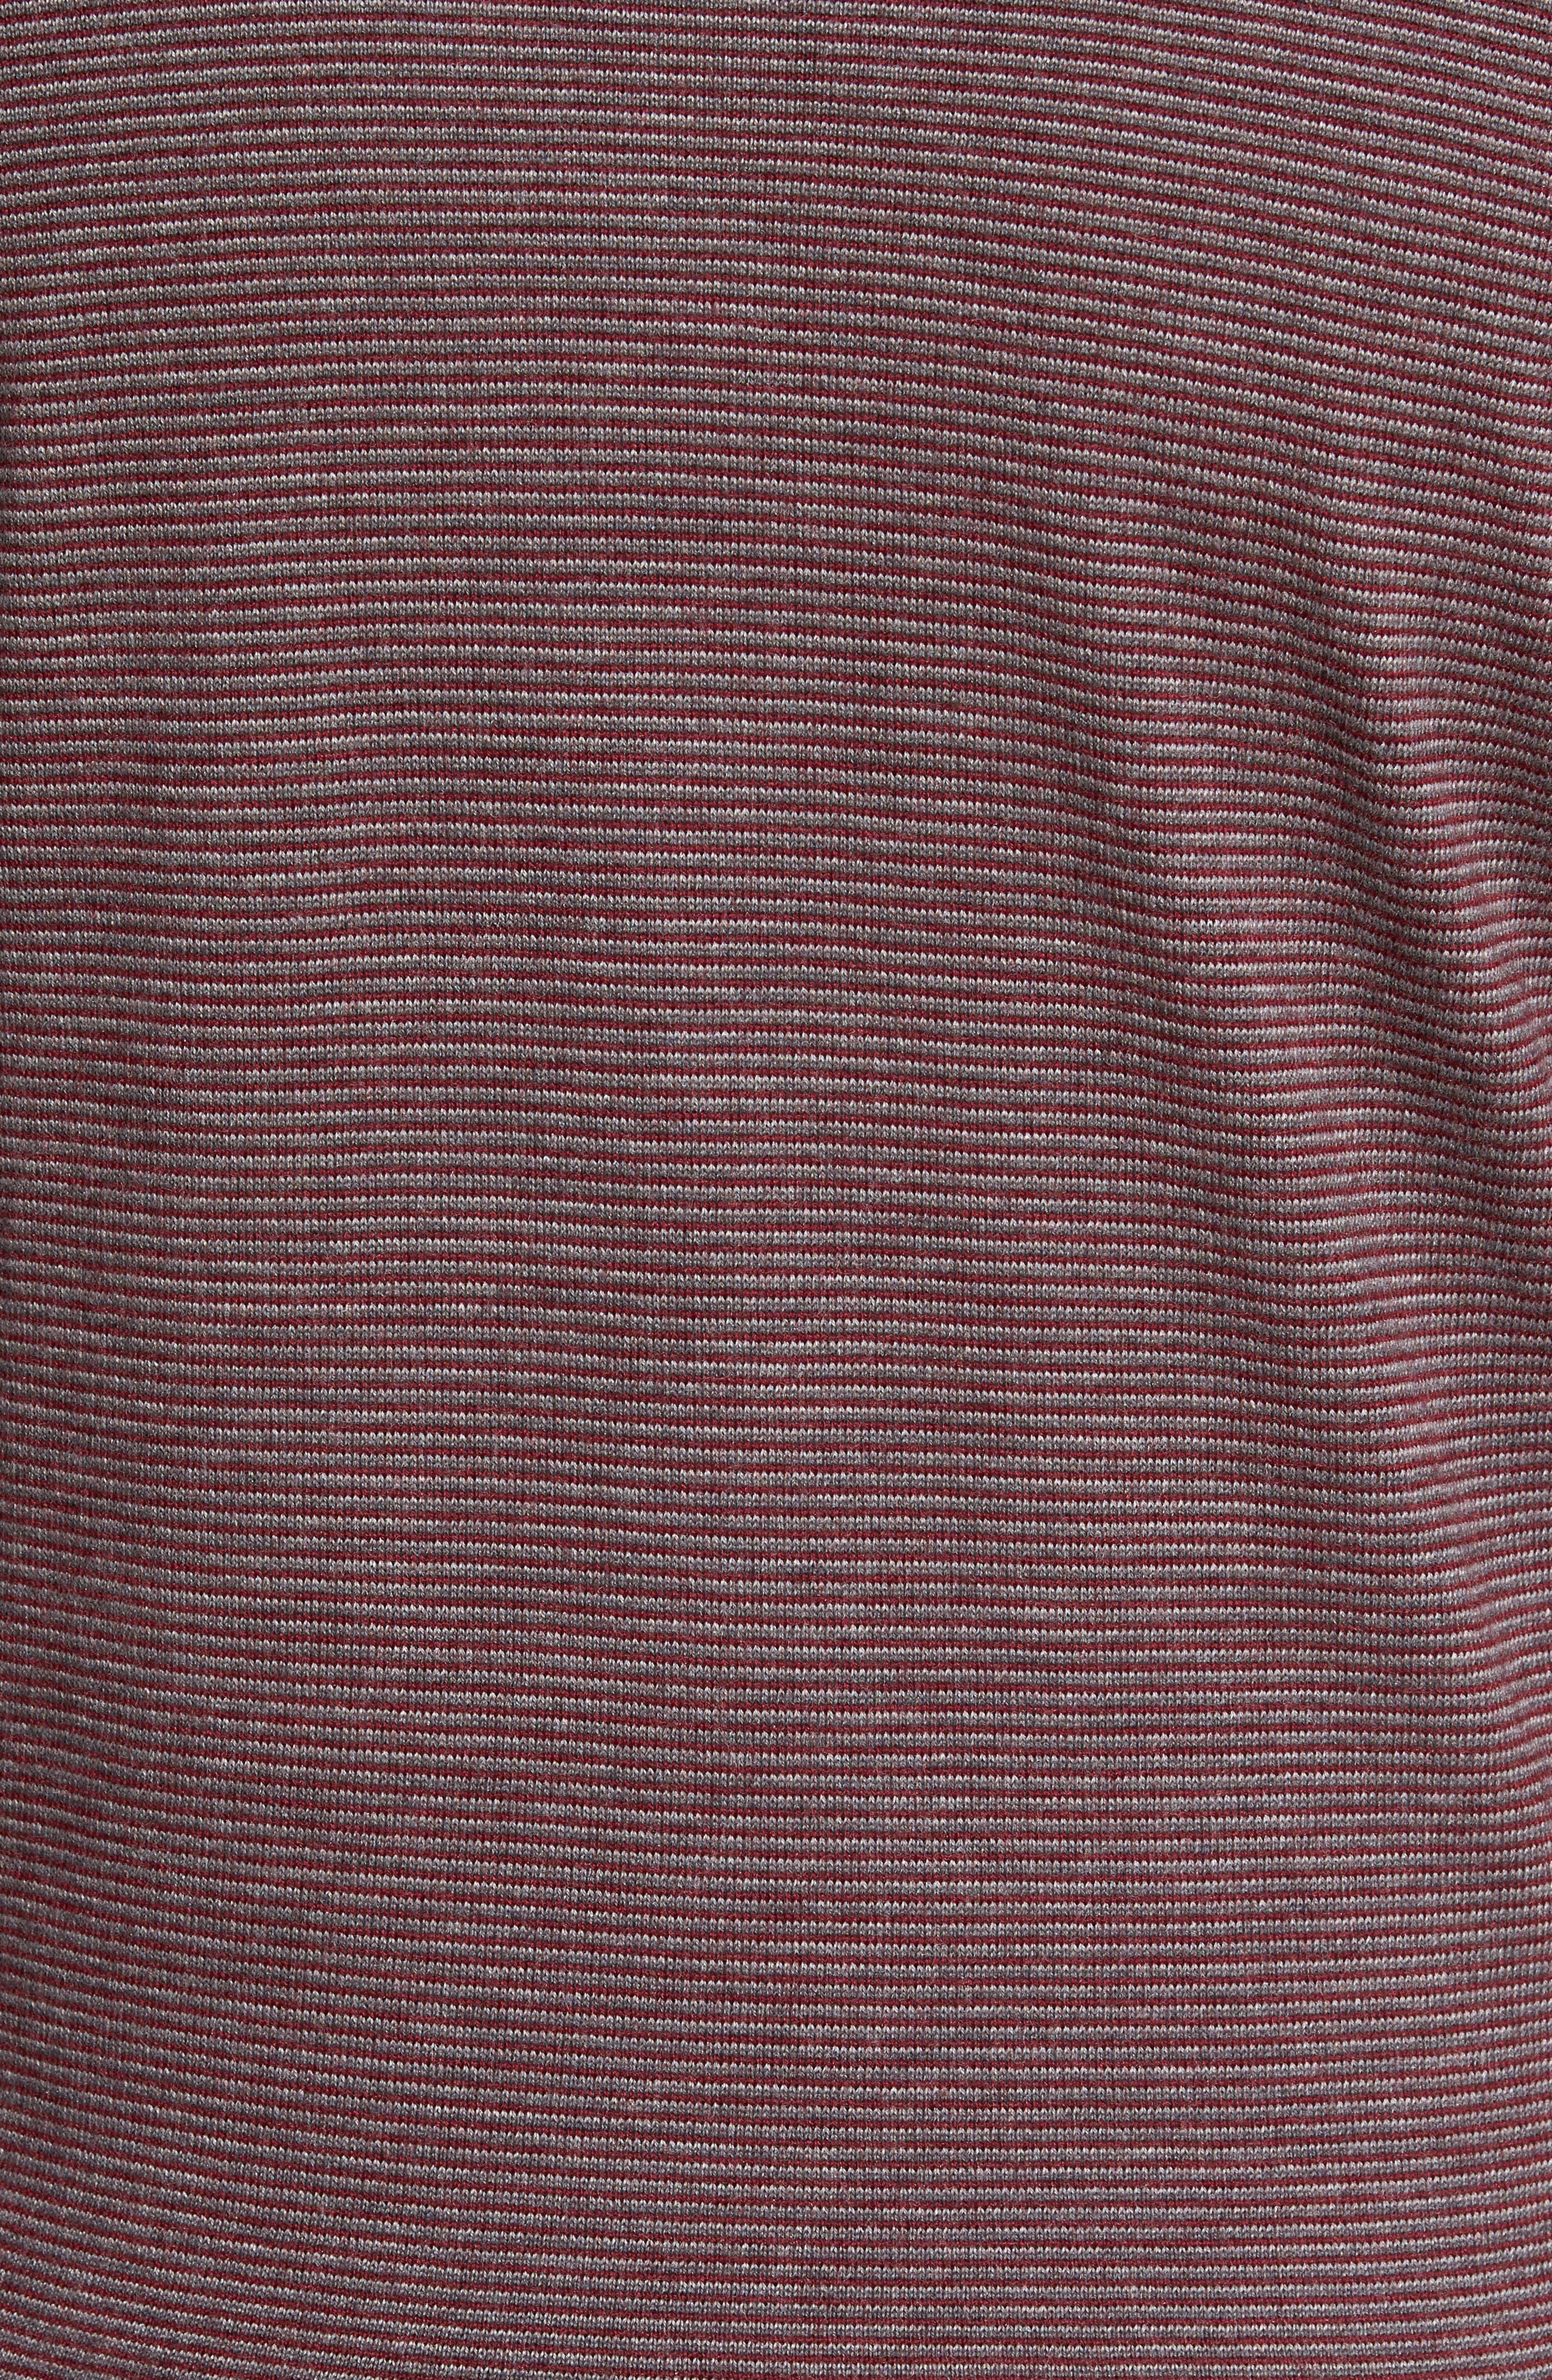 Trichrome Stripe Merino Wool Blend Sweater,                             Alternate thumbnail 5, color,                             930